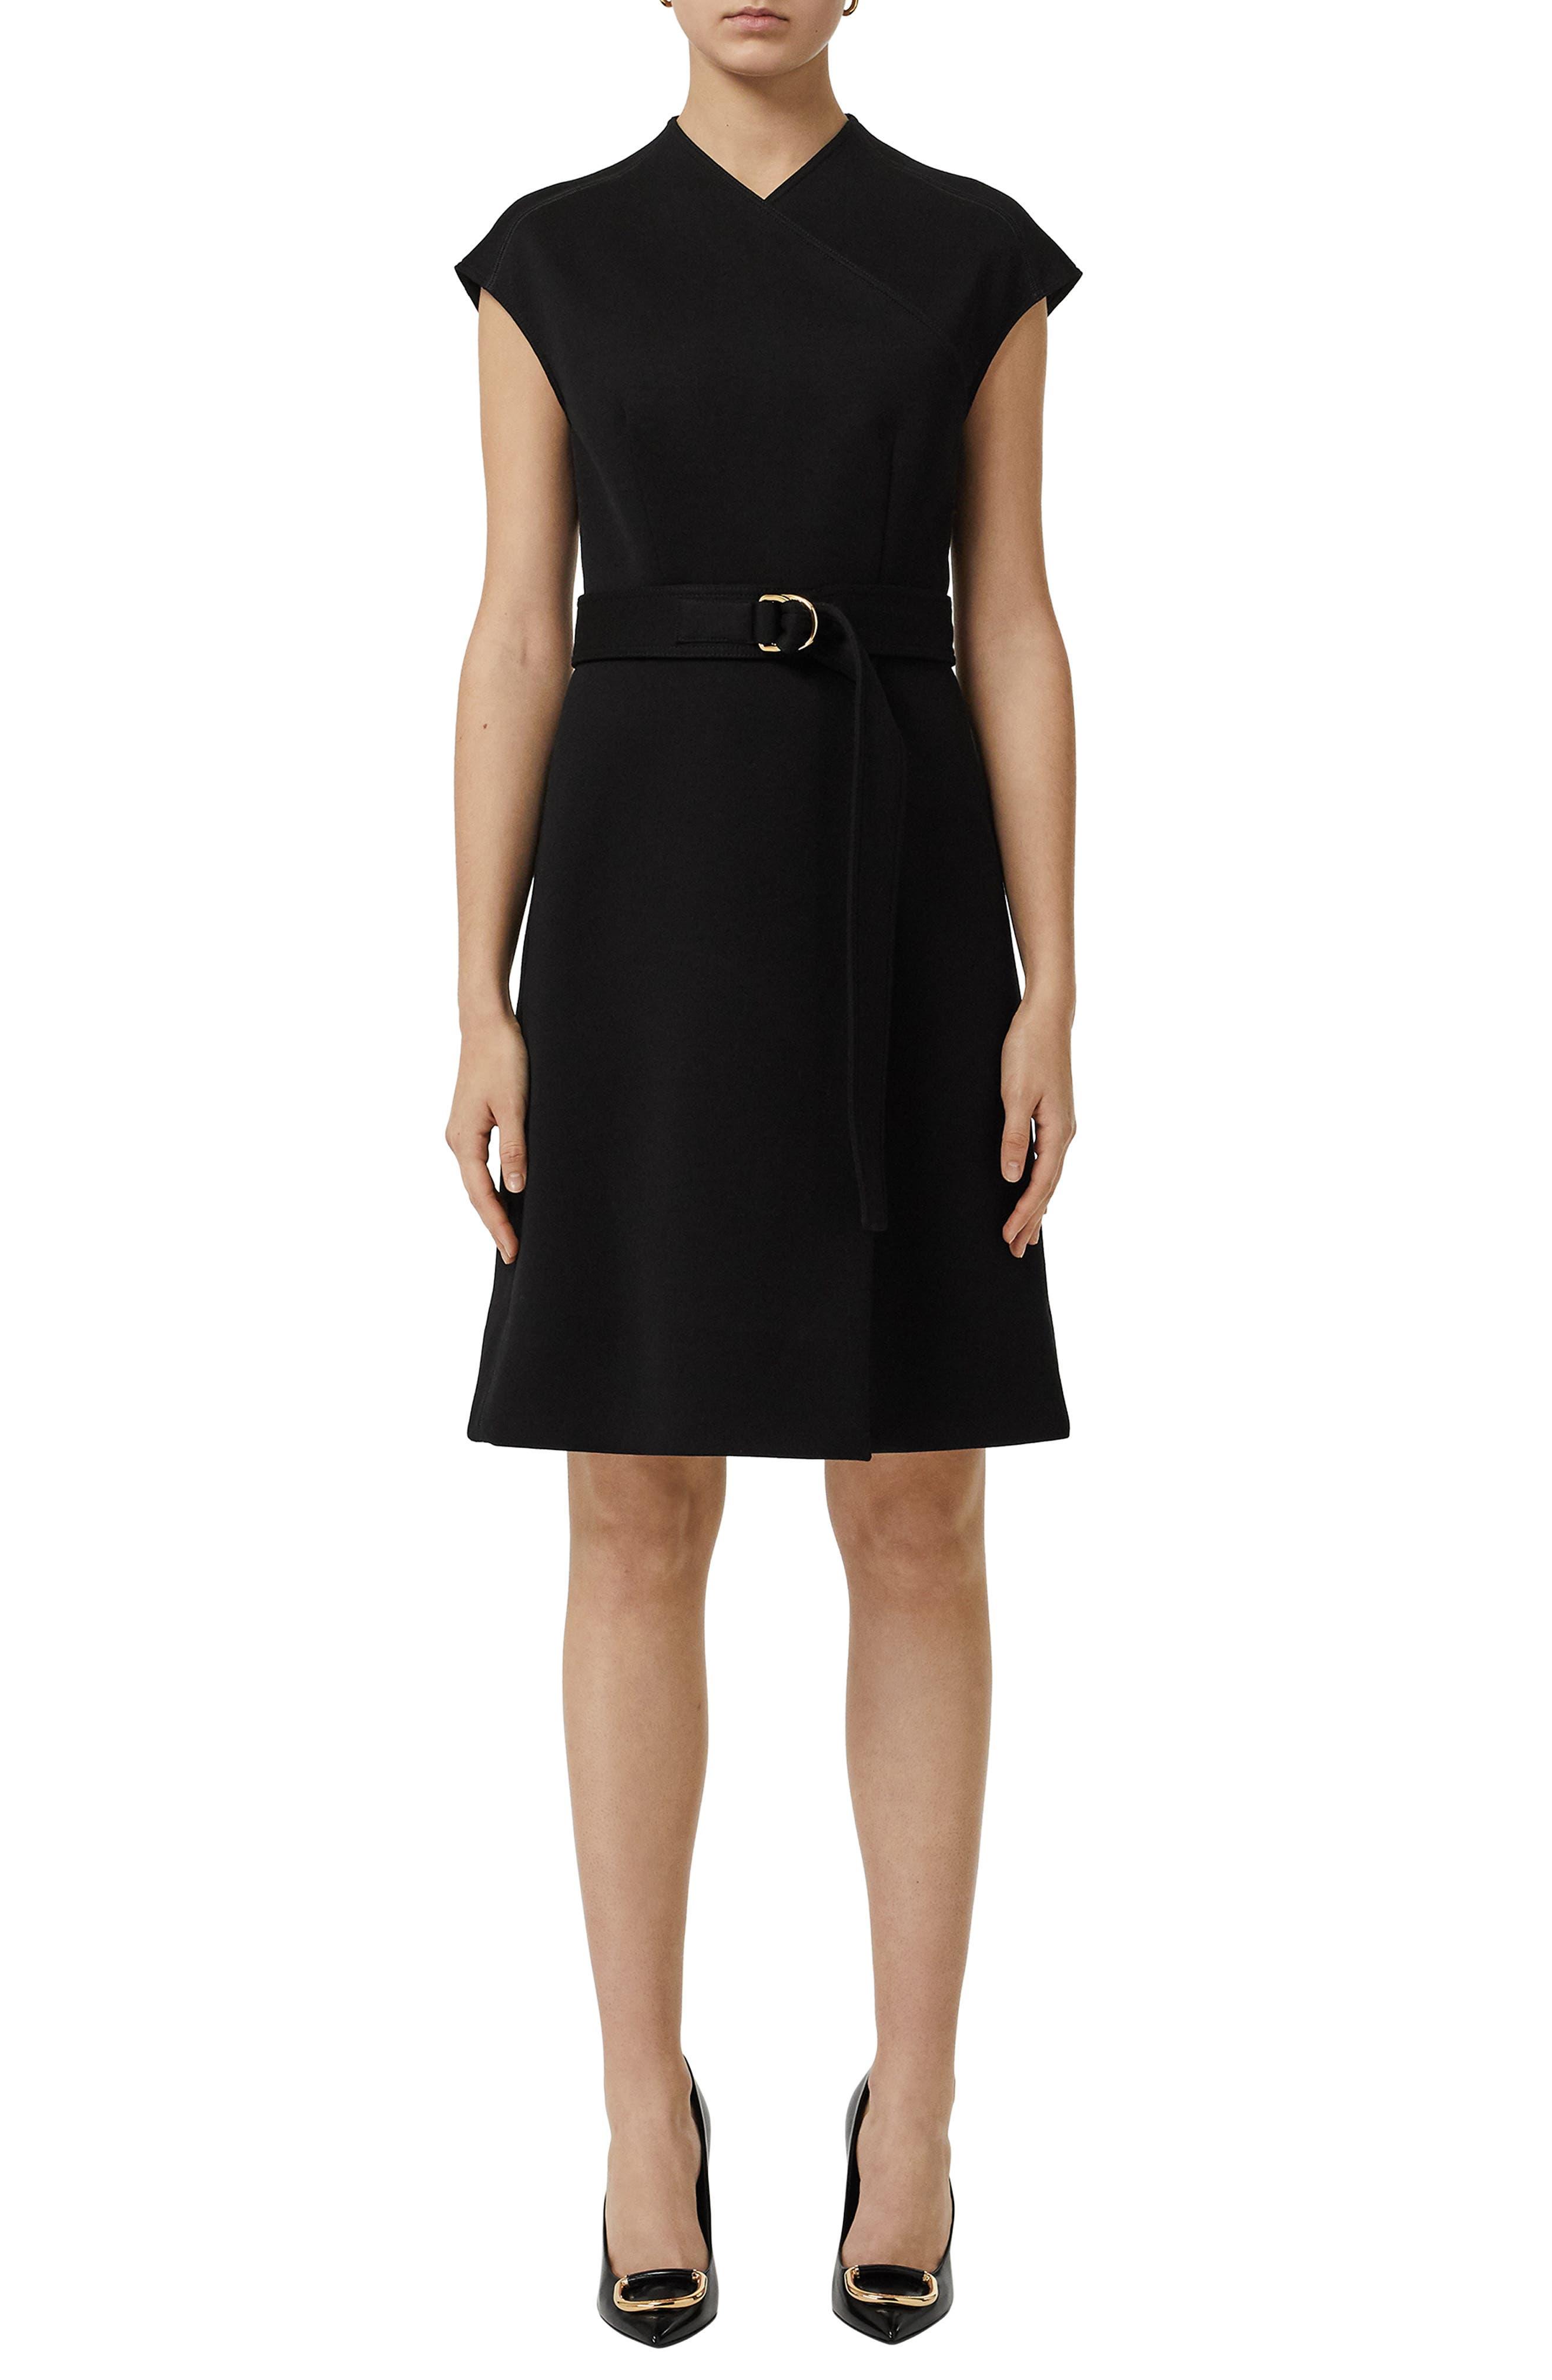 Dulsie D-Ring Detail Bonded Jersey Dress,                             Main thumbnail 1, color,                             BLACK